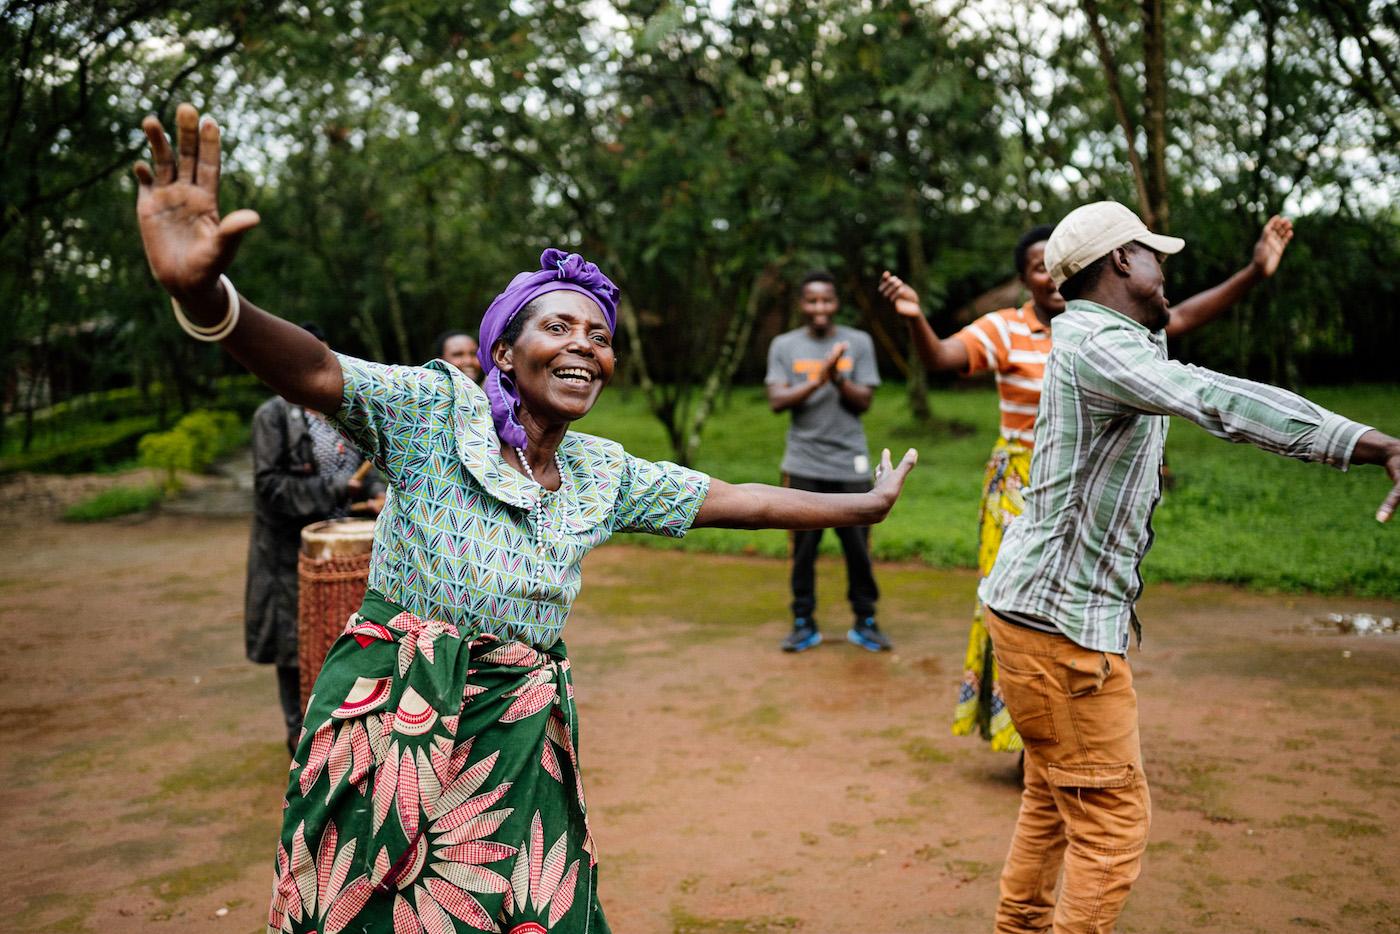 rwanda Red Rocks community center